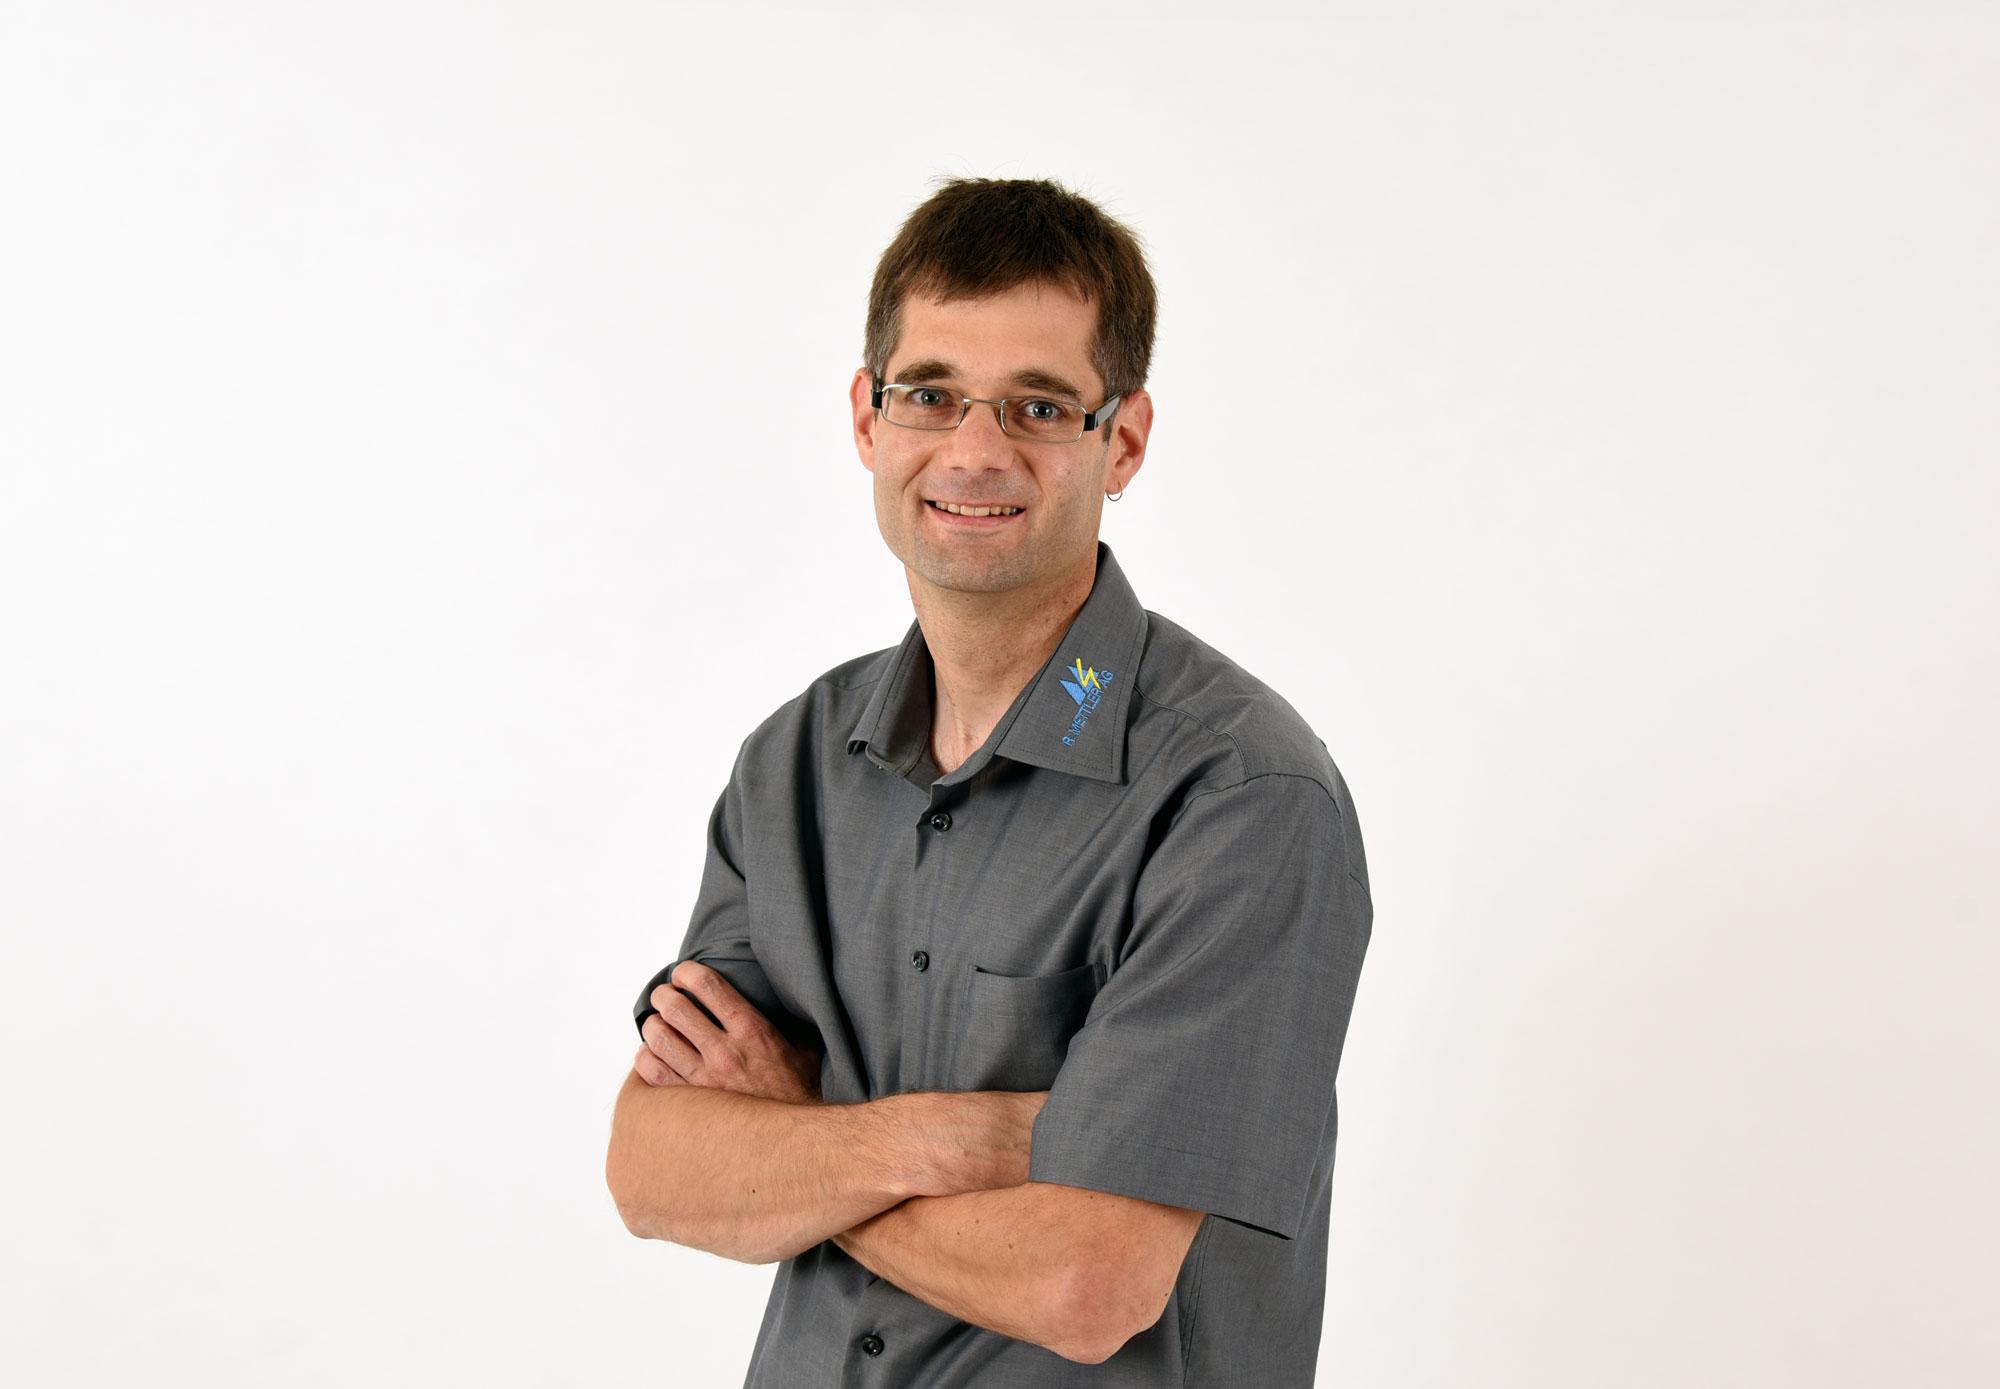 Stefan Marent